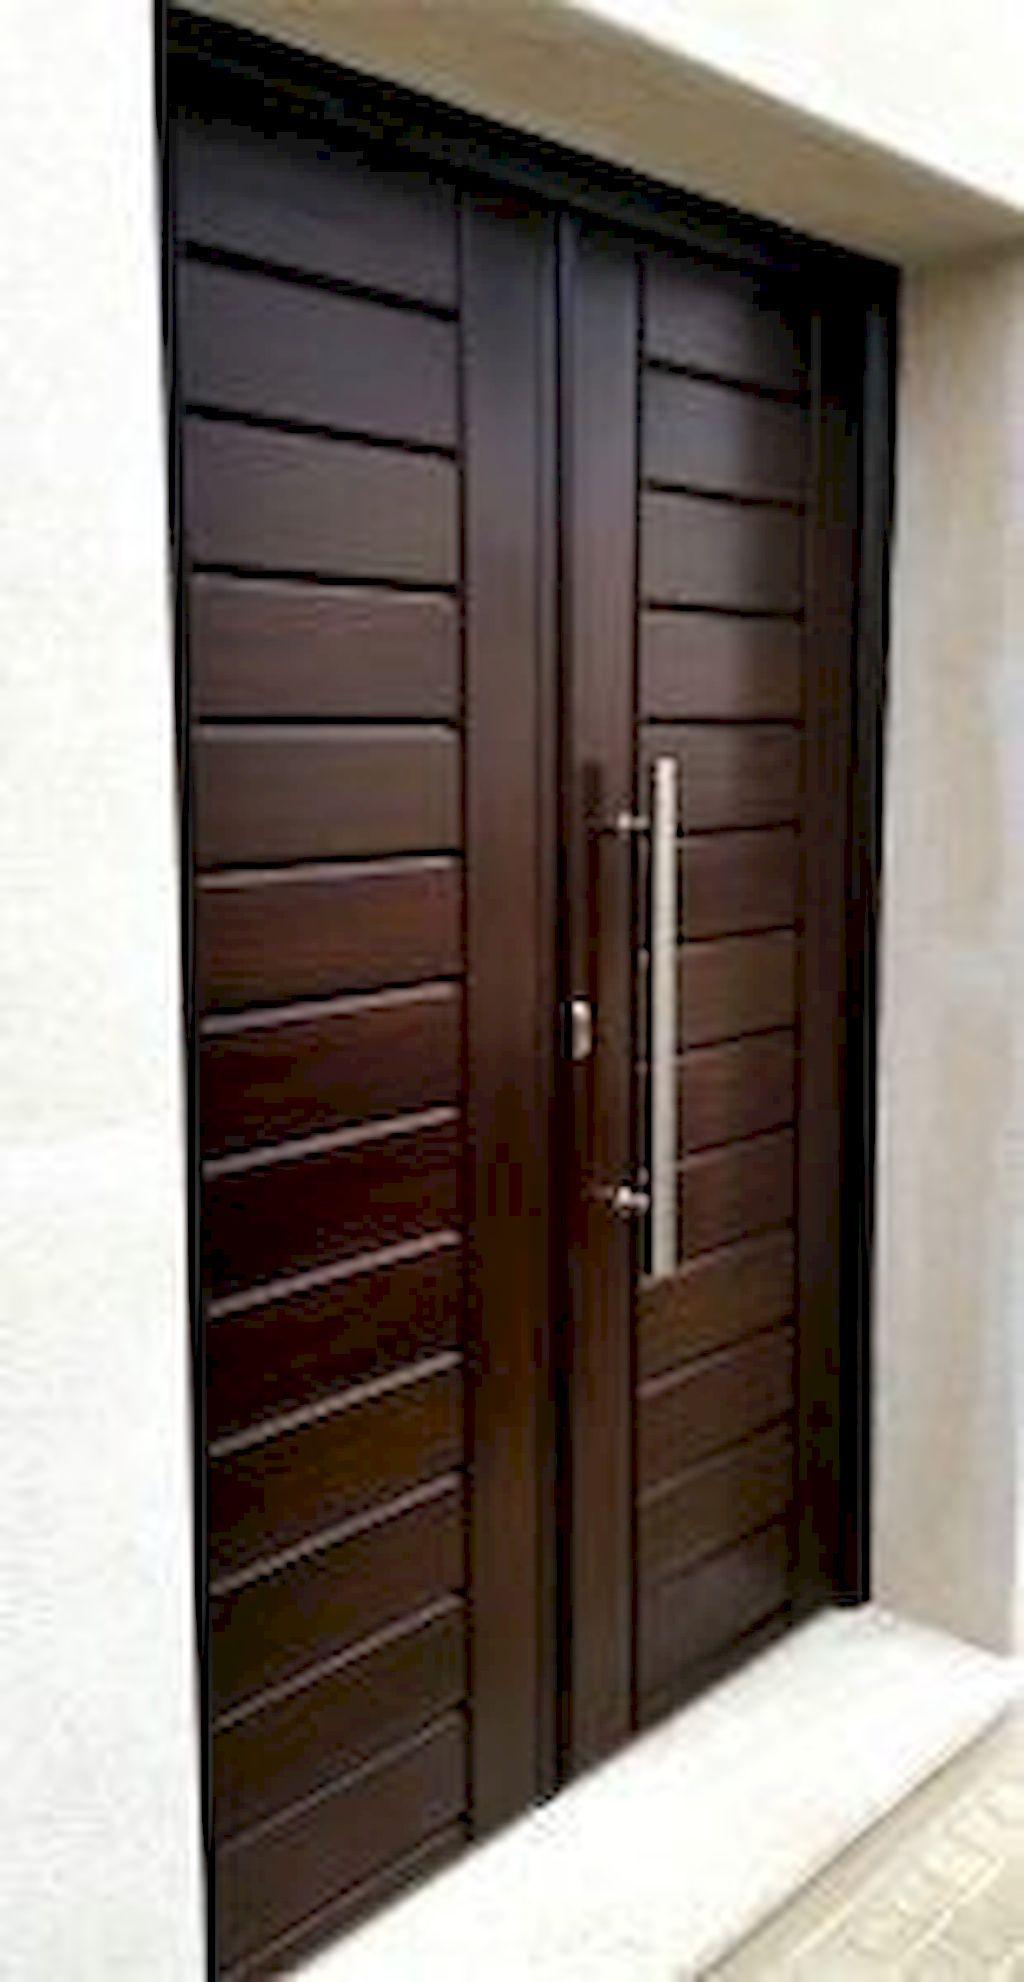 Great 10 Ideas For A Special Entrance To Your Home Https Homemidi Com 2019 04 04 10 Ideas For Wooden Door Design Wooden Double Doors Modern Entrance Door